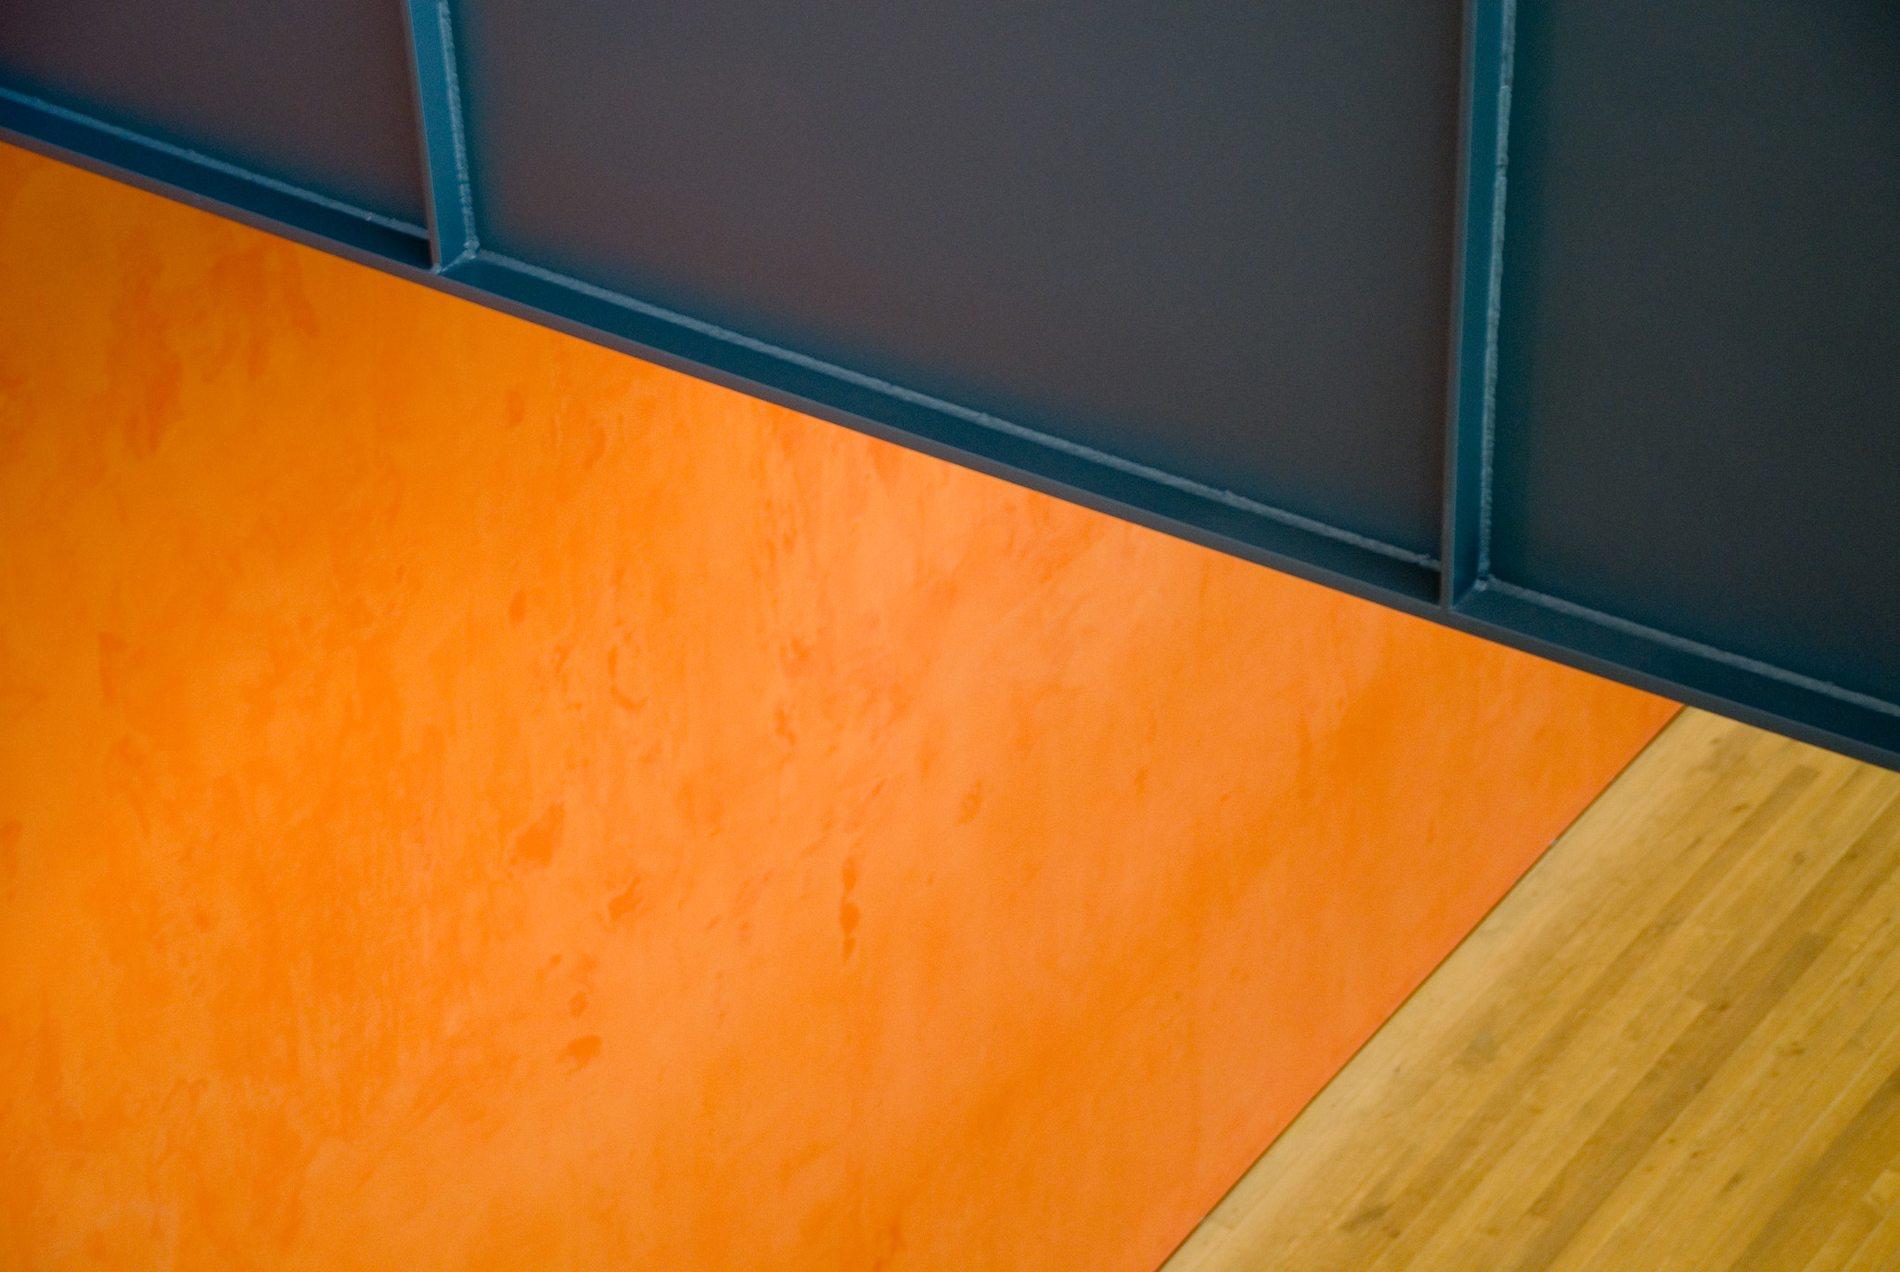 Zentrum Paul Klee. Materialienmix in der Ebene des Kindermuseums.